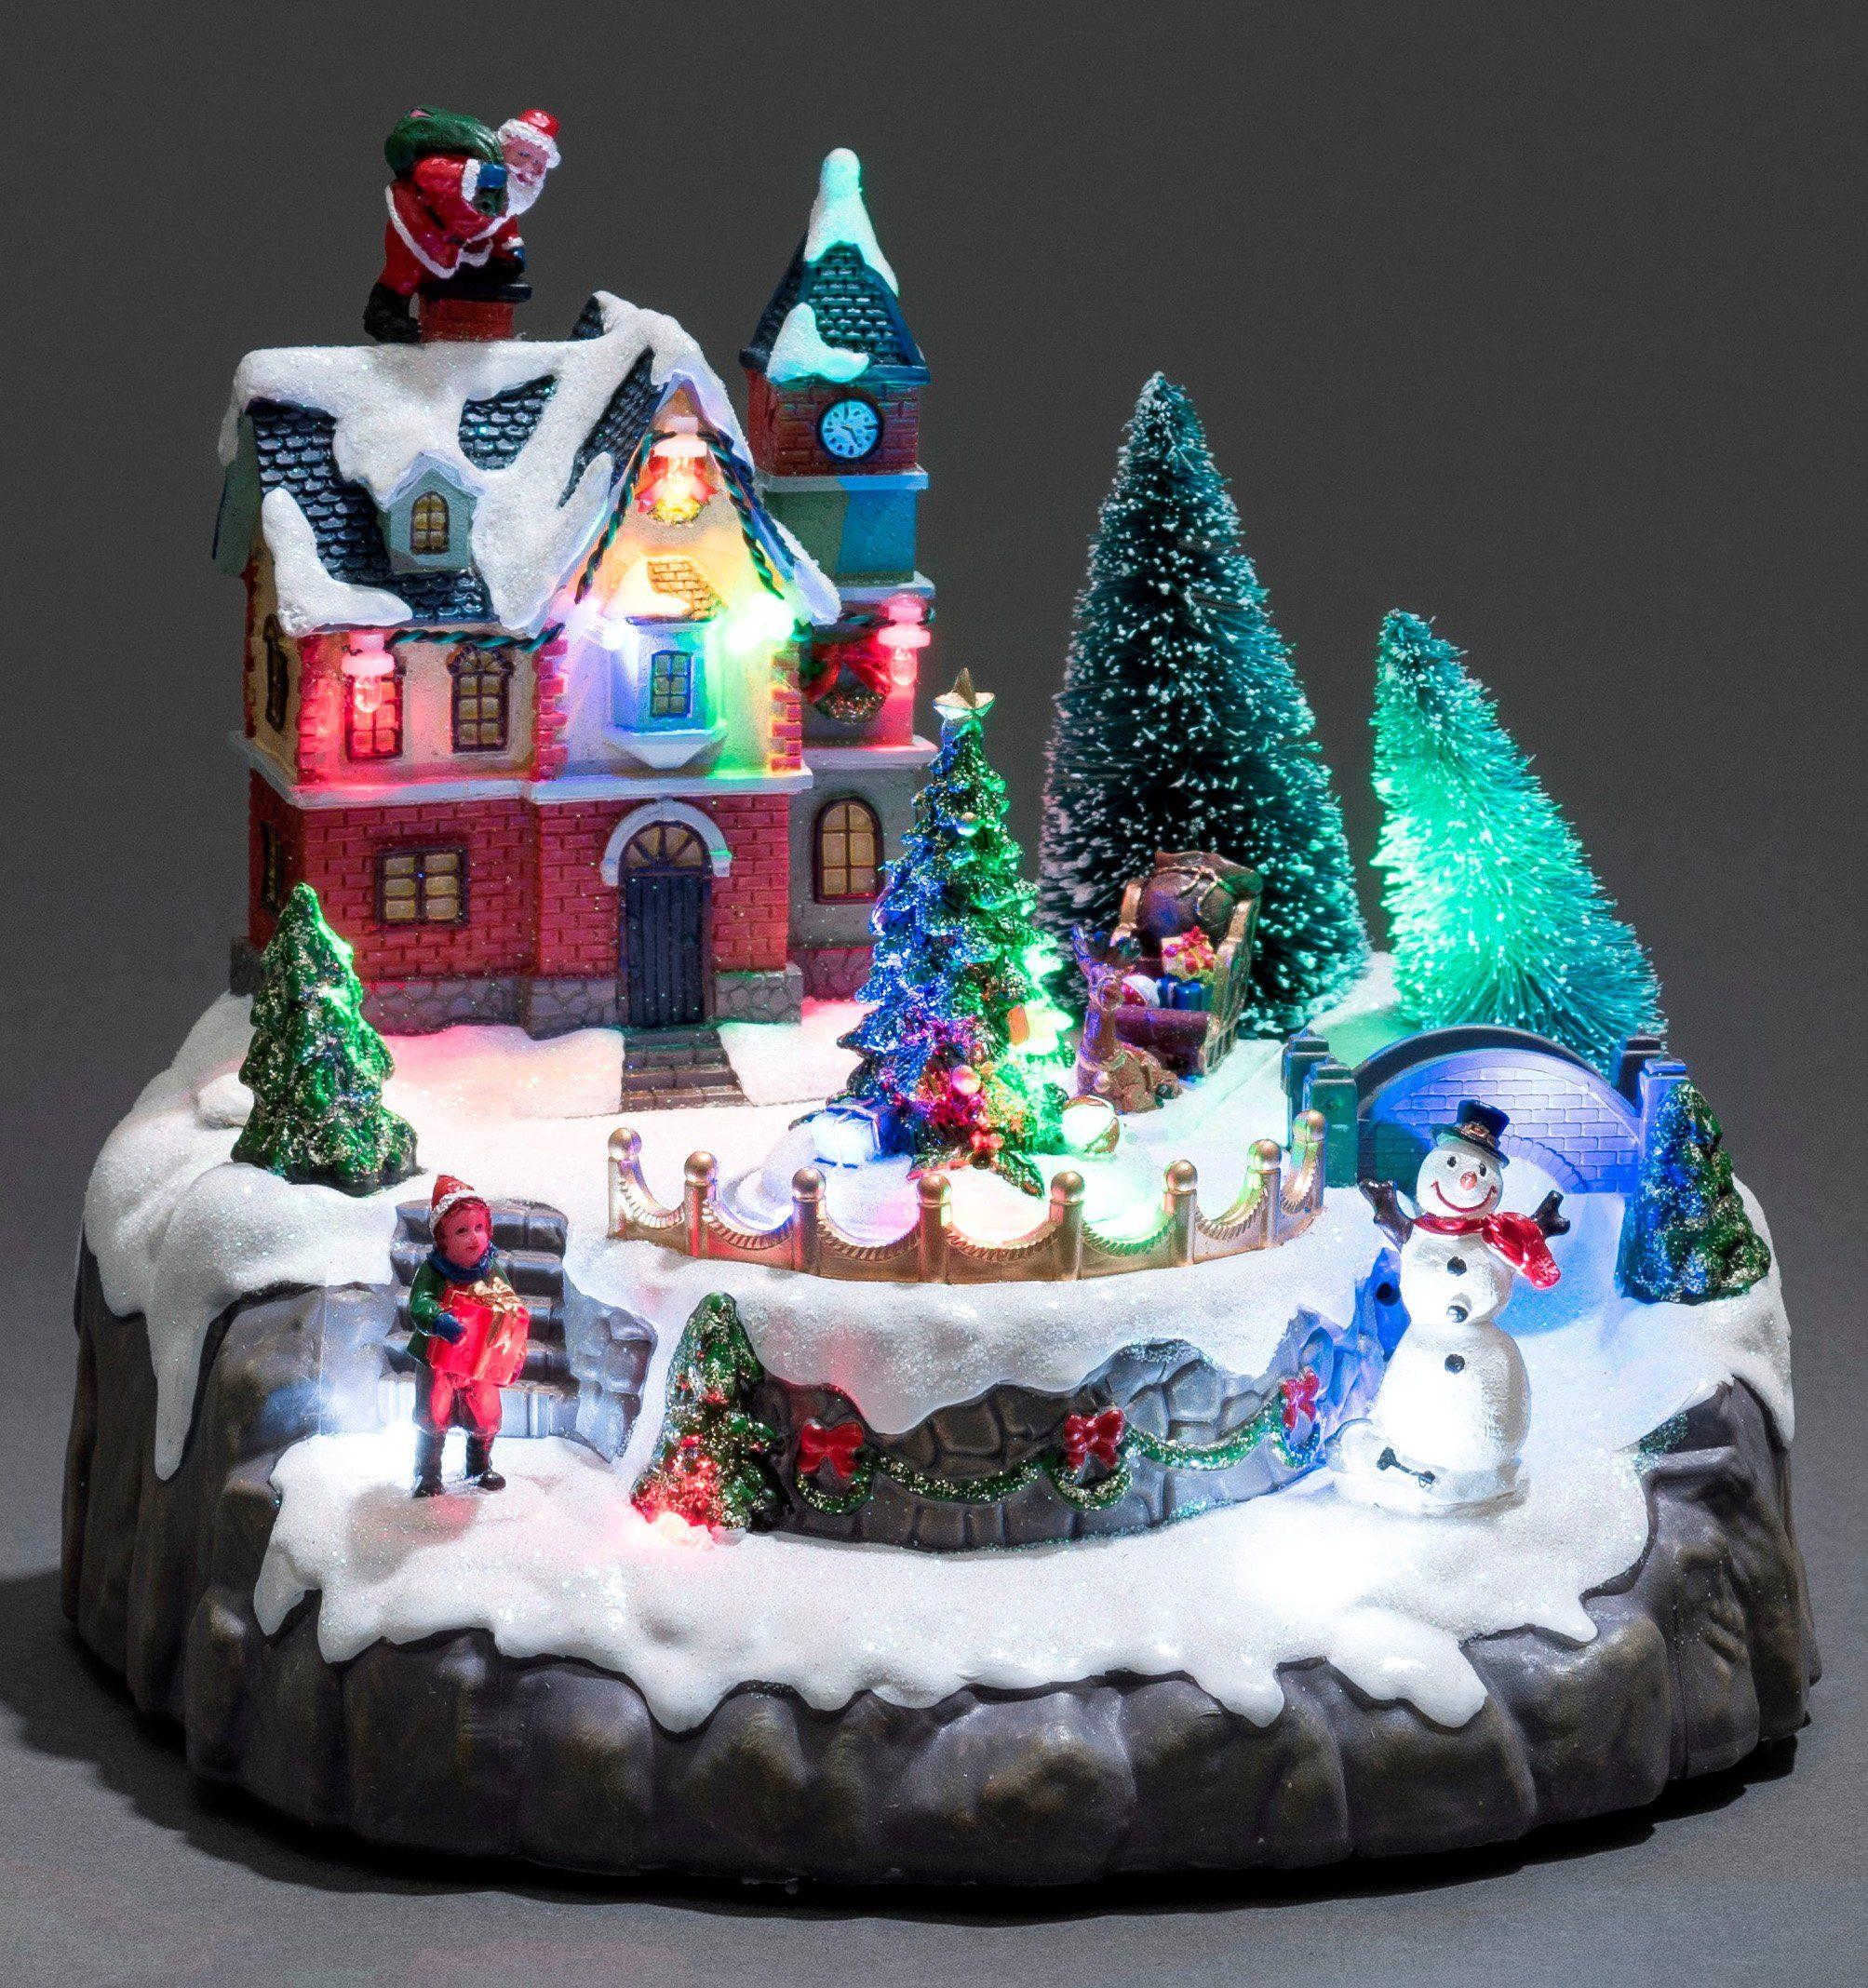 Konstsmide LED Szenerie, »Wohnhaus mit Weihnachtsbäumen«